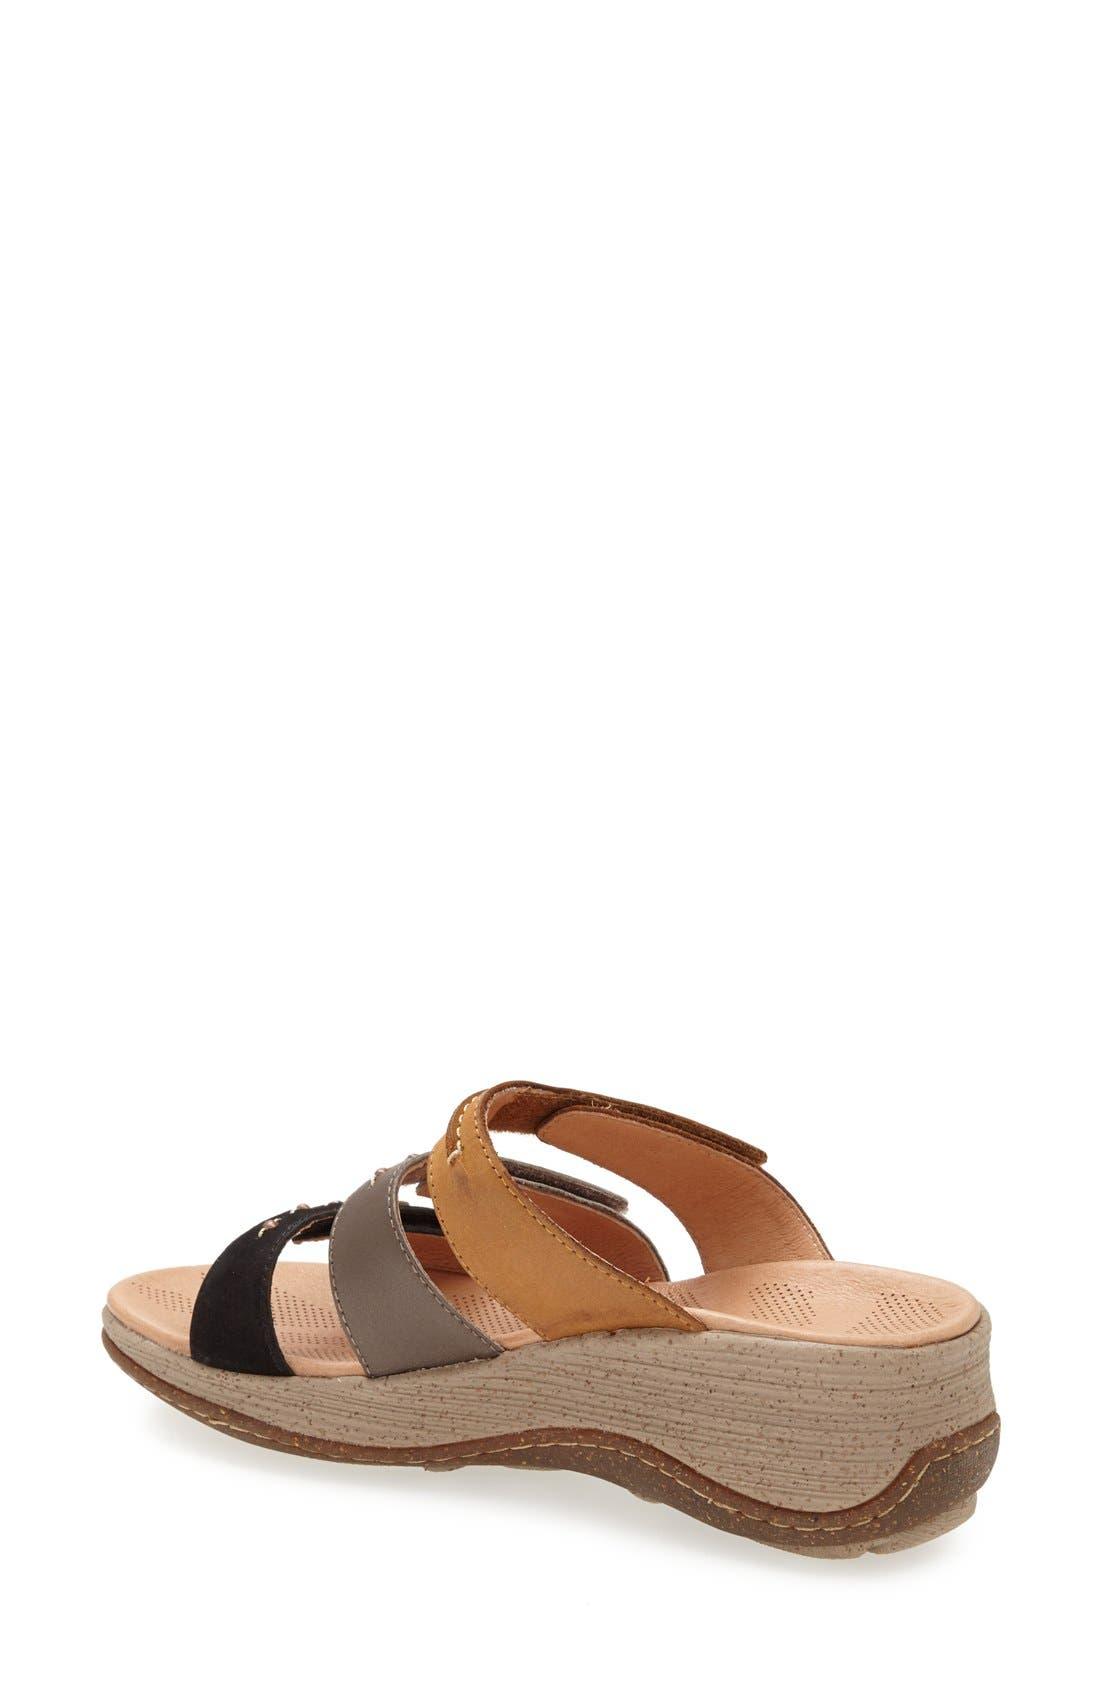 Alternate Image 2  - Acorn 'Vista' Wedge Sandal (Women)